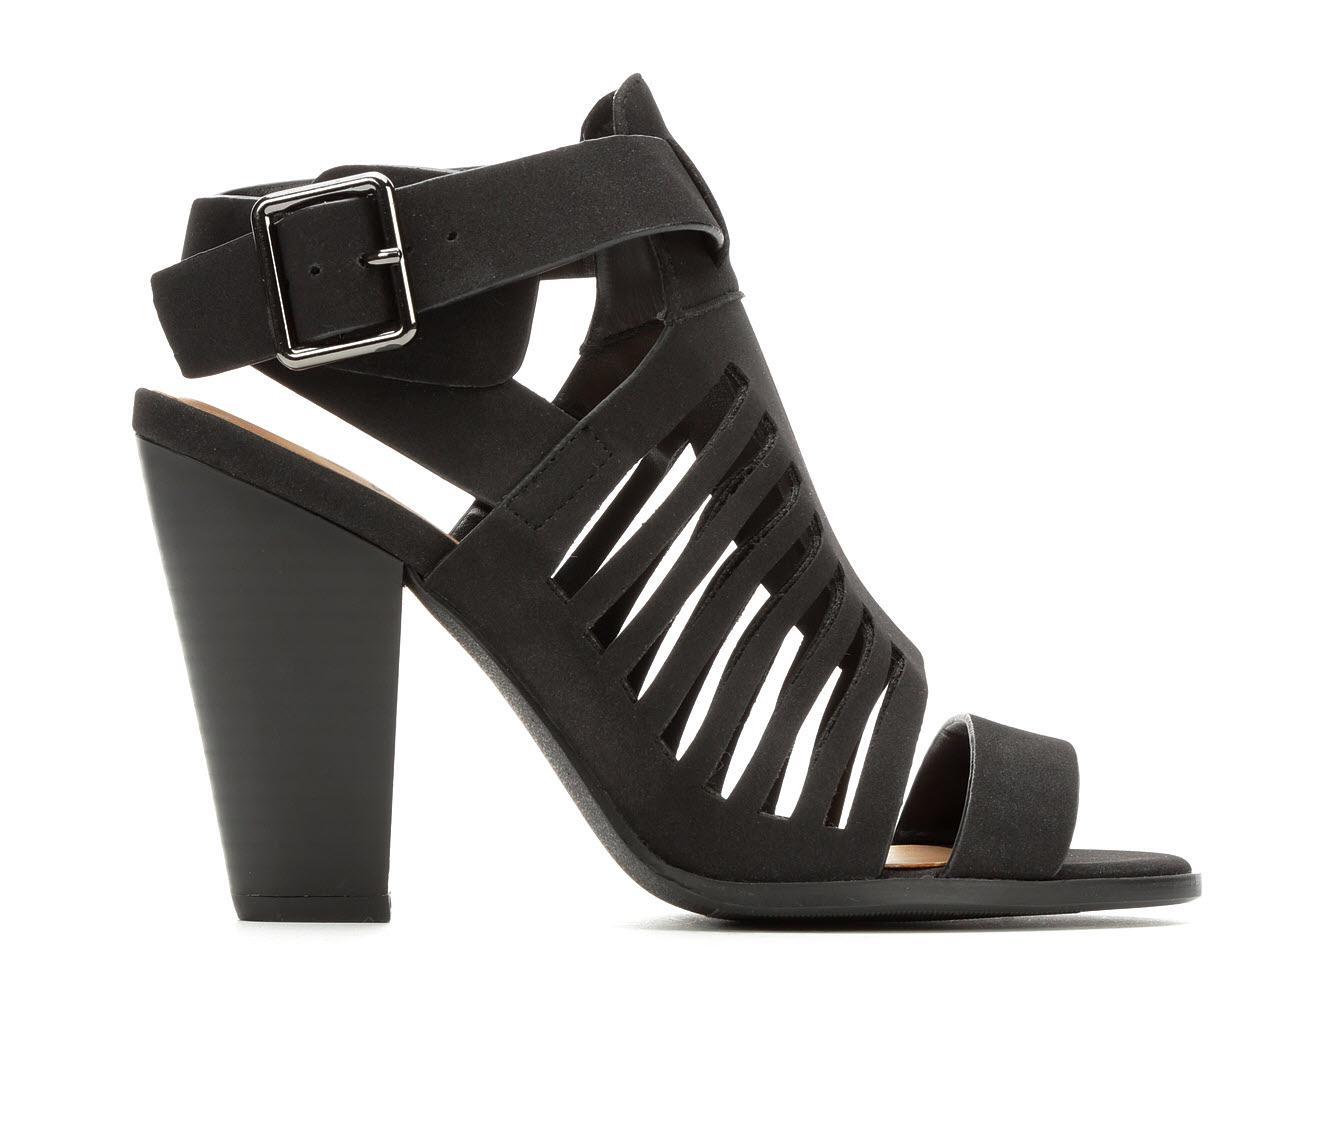 Delicious Yummy Women's Dress Shoe (Black Faux Leather)